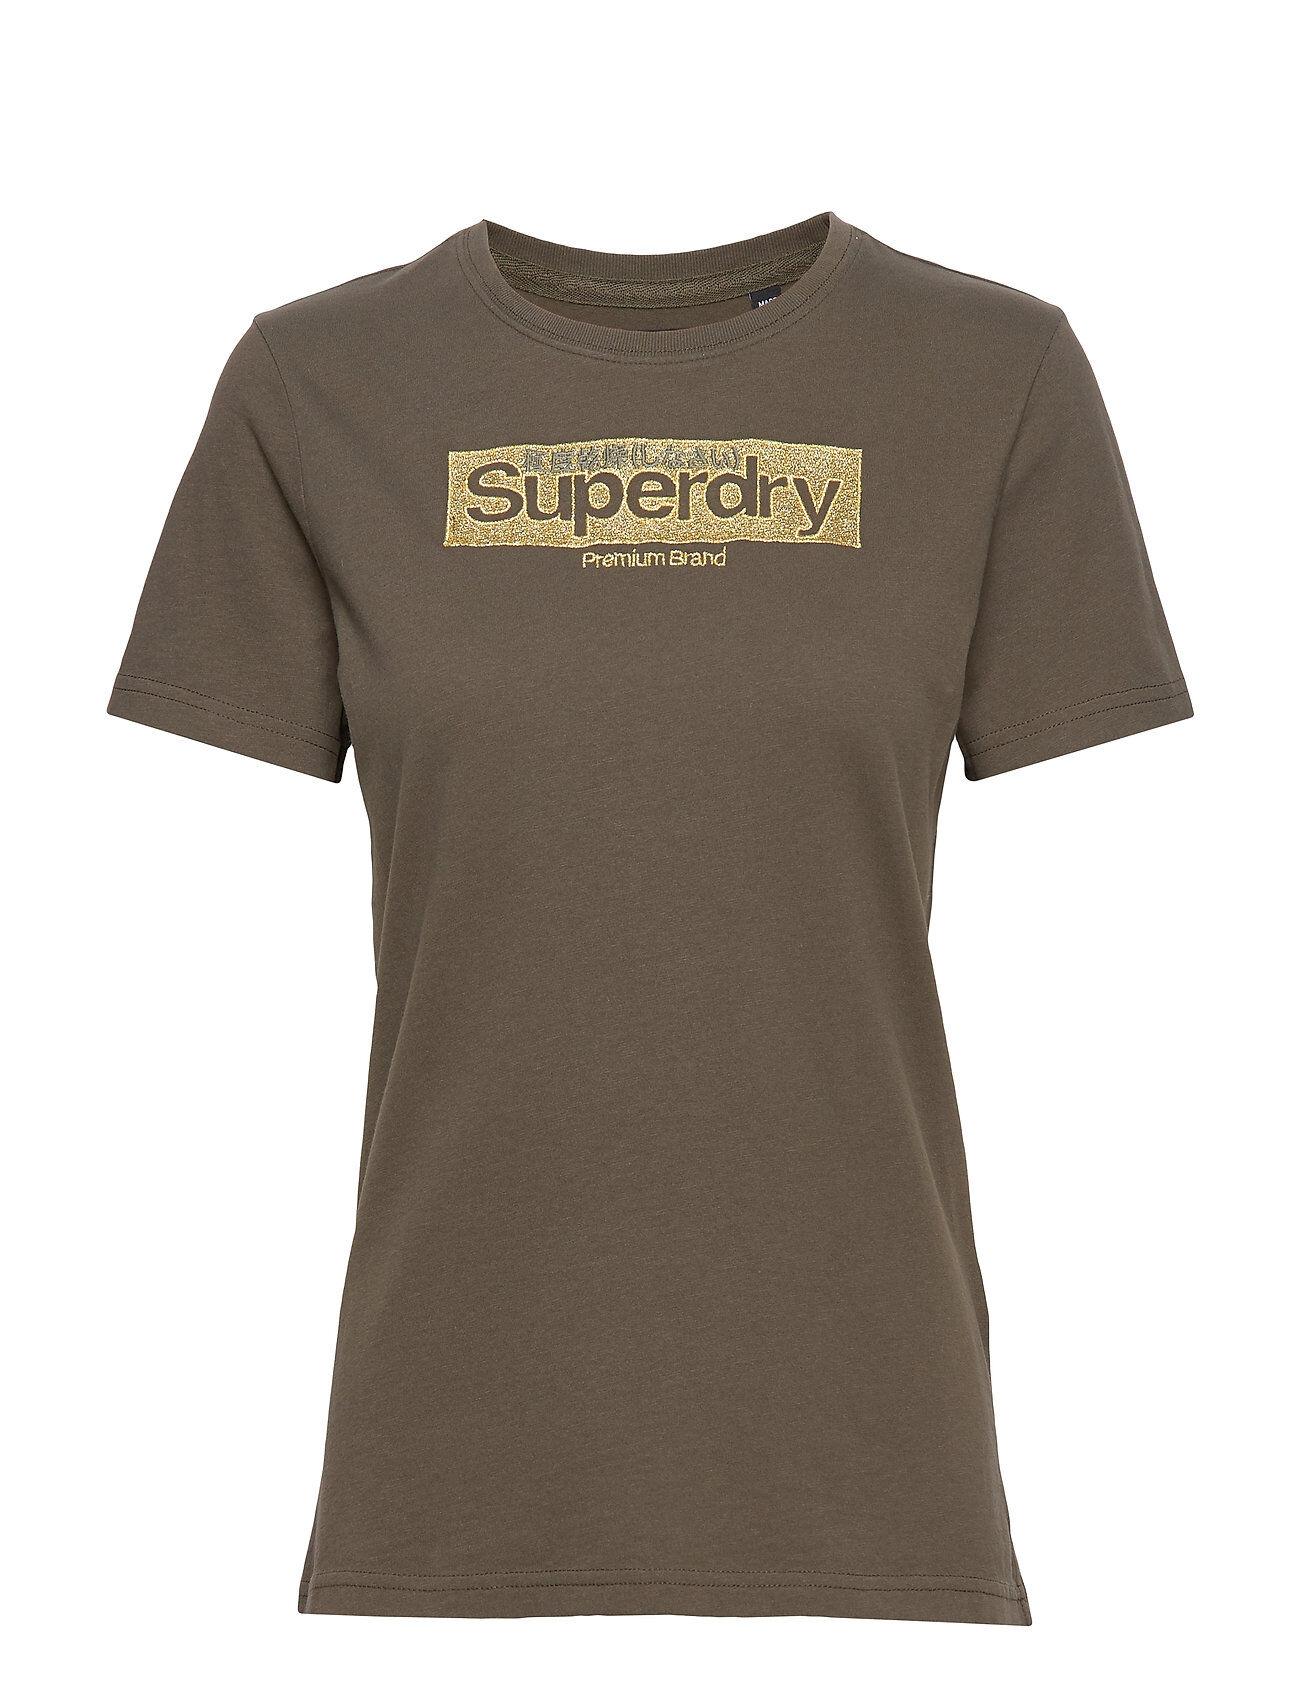 Superdry Premium Brand Emb Entry Tee T-shirts & Tops Short-sleeved Vihreä